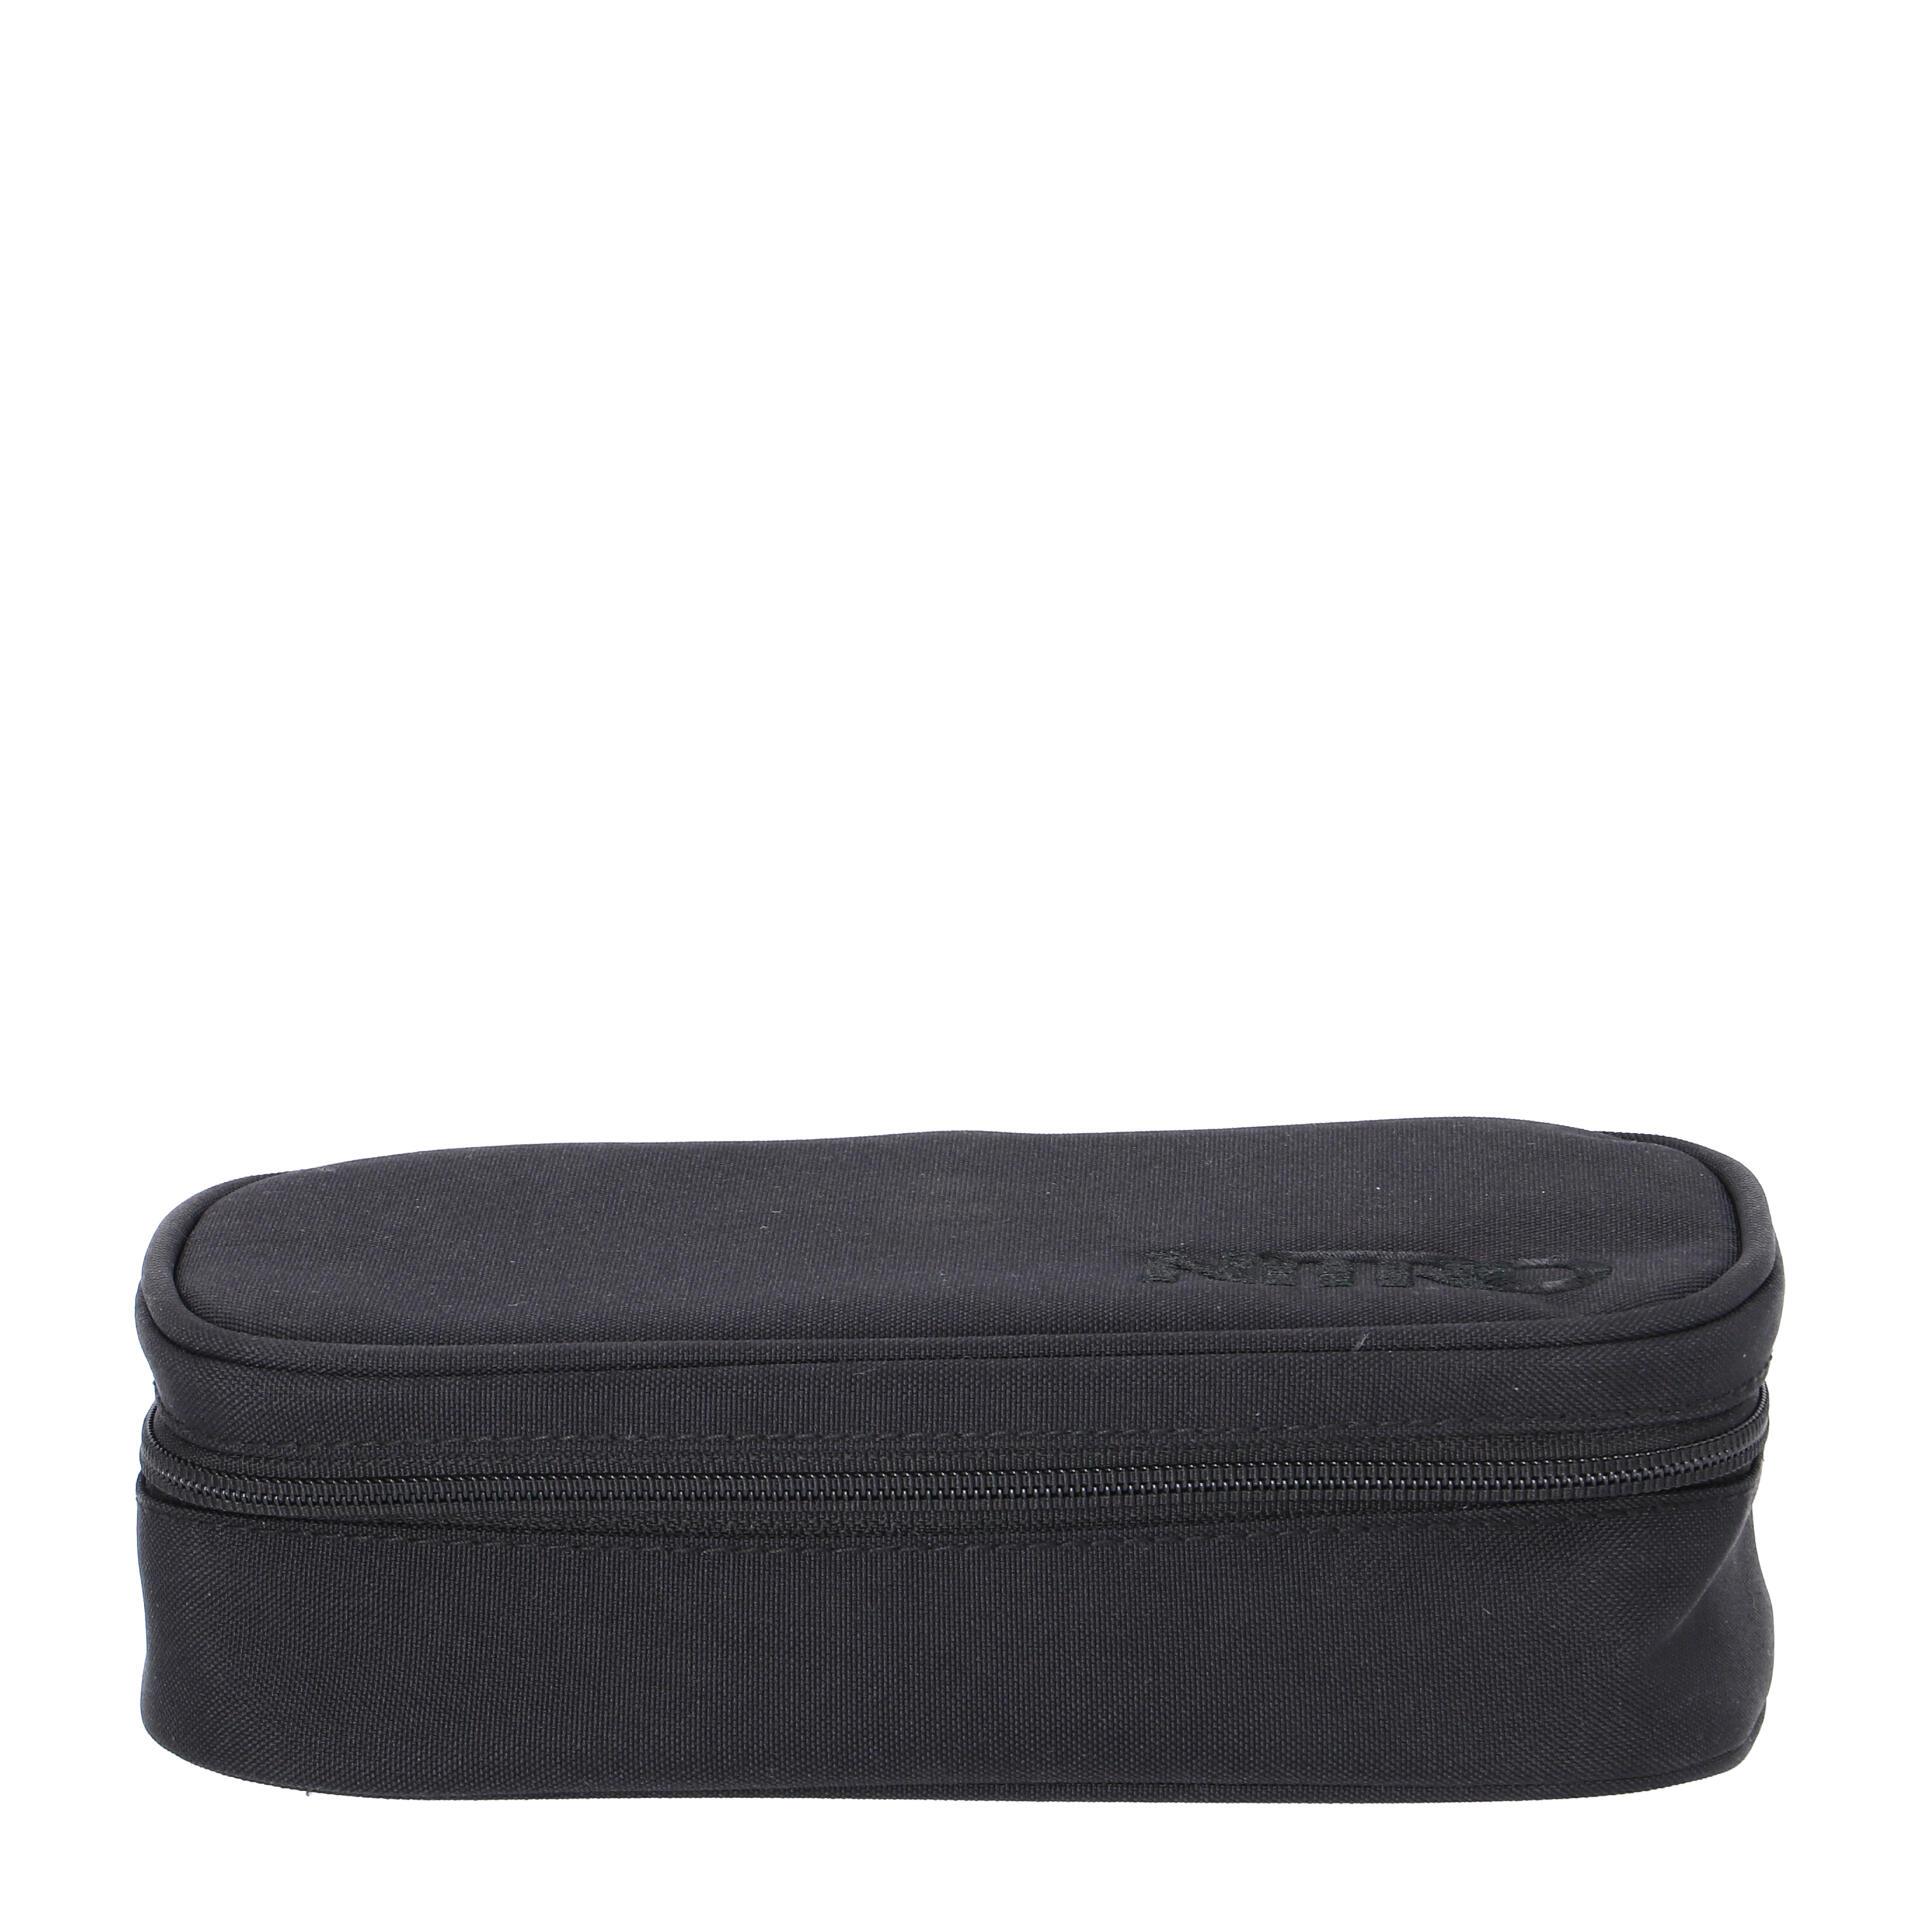 Pencil Case XL Stifteetui true black